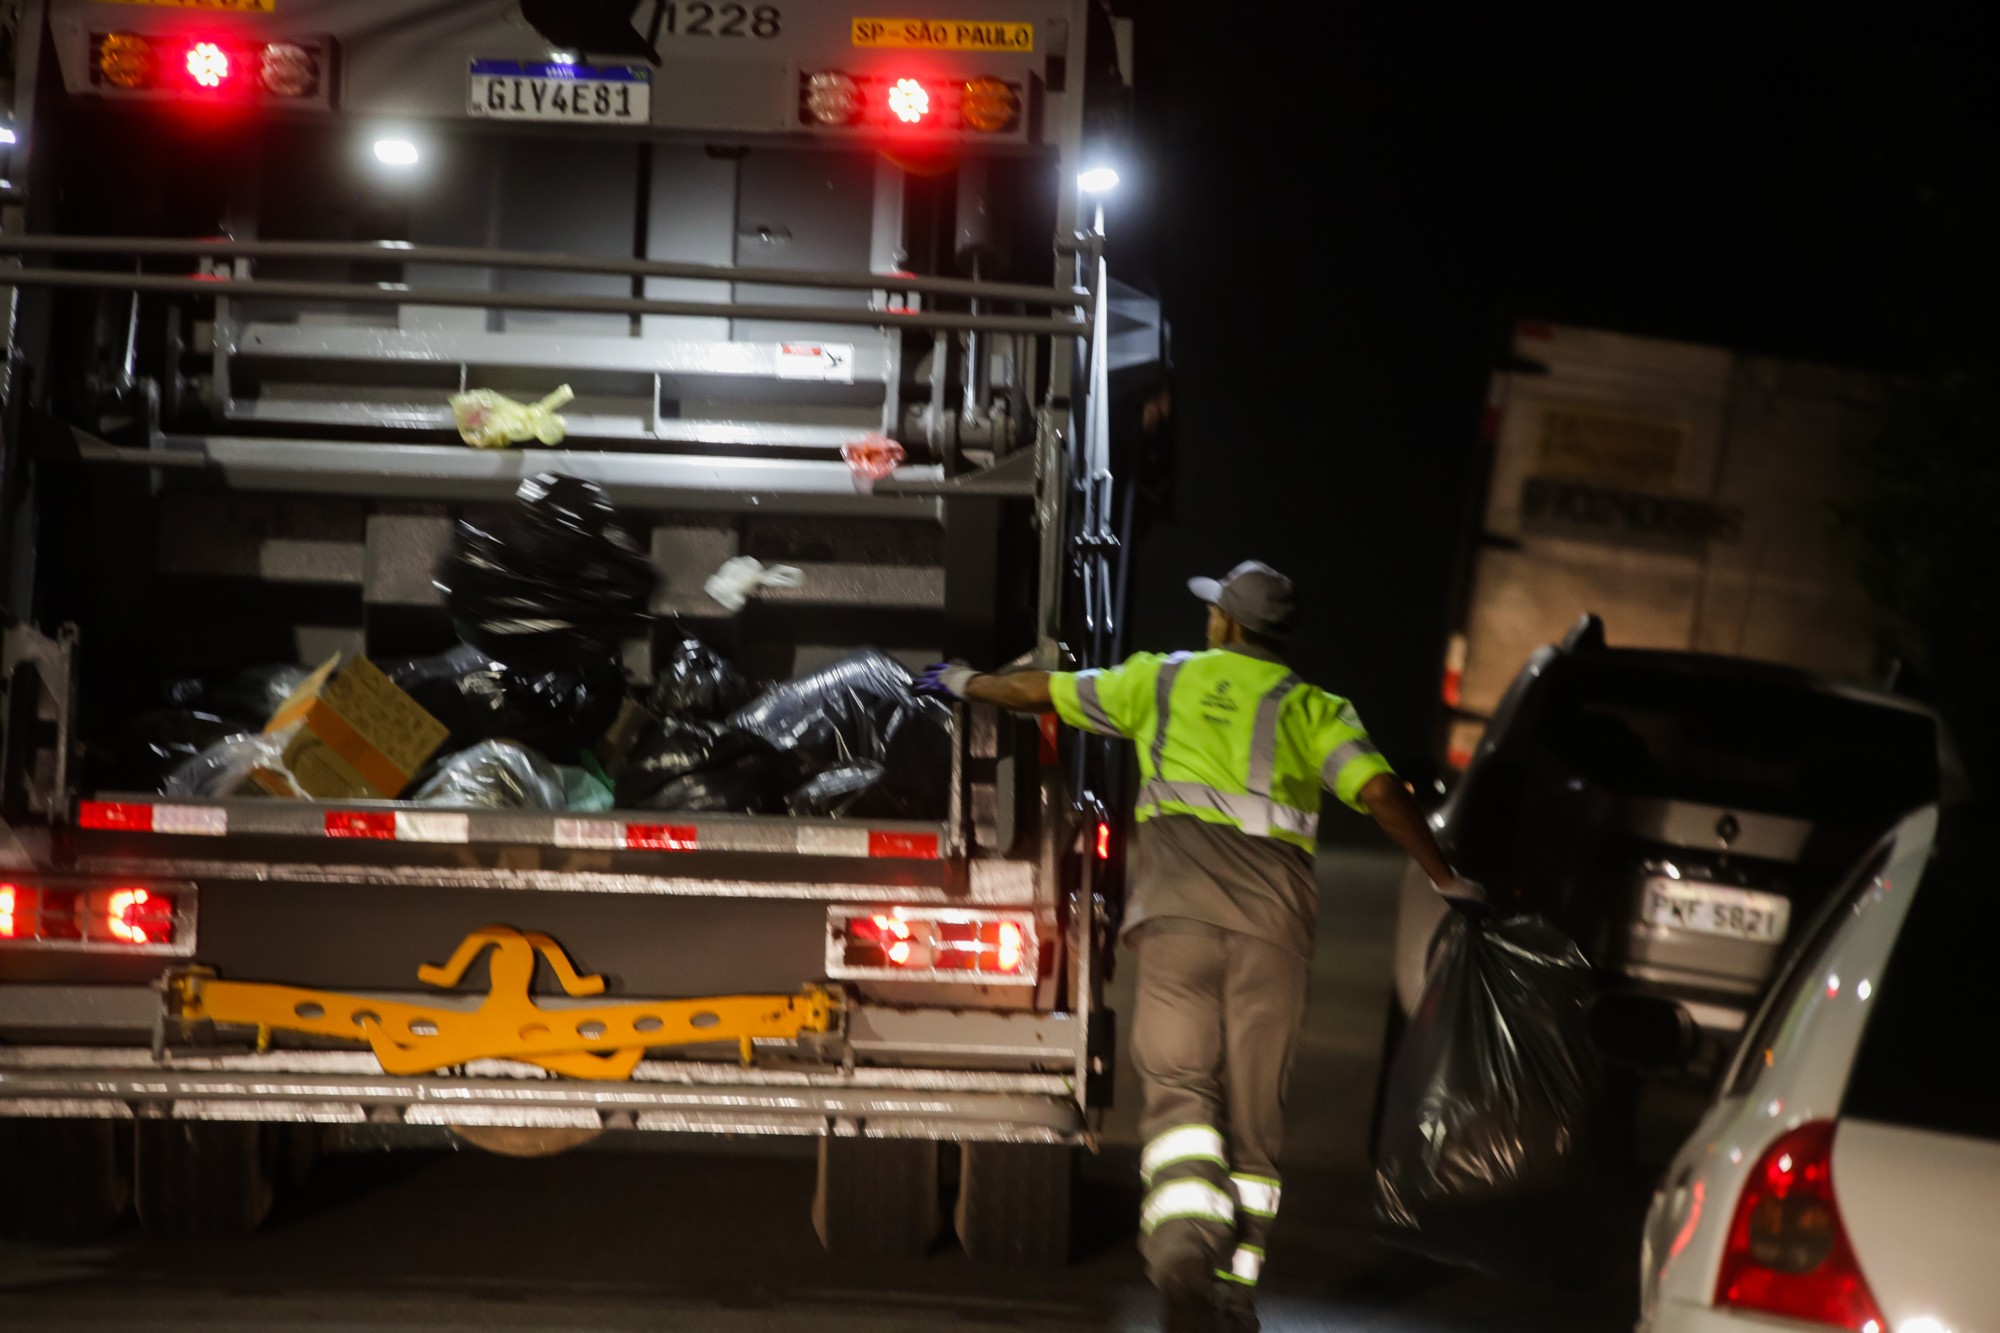 coletores de lixo-2771 - 18